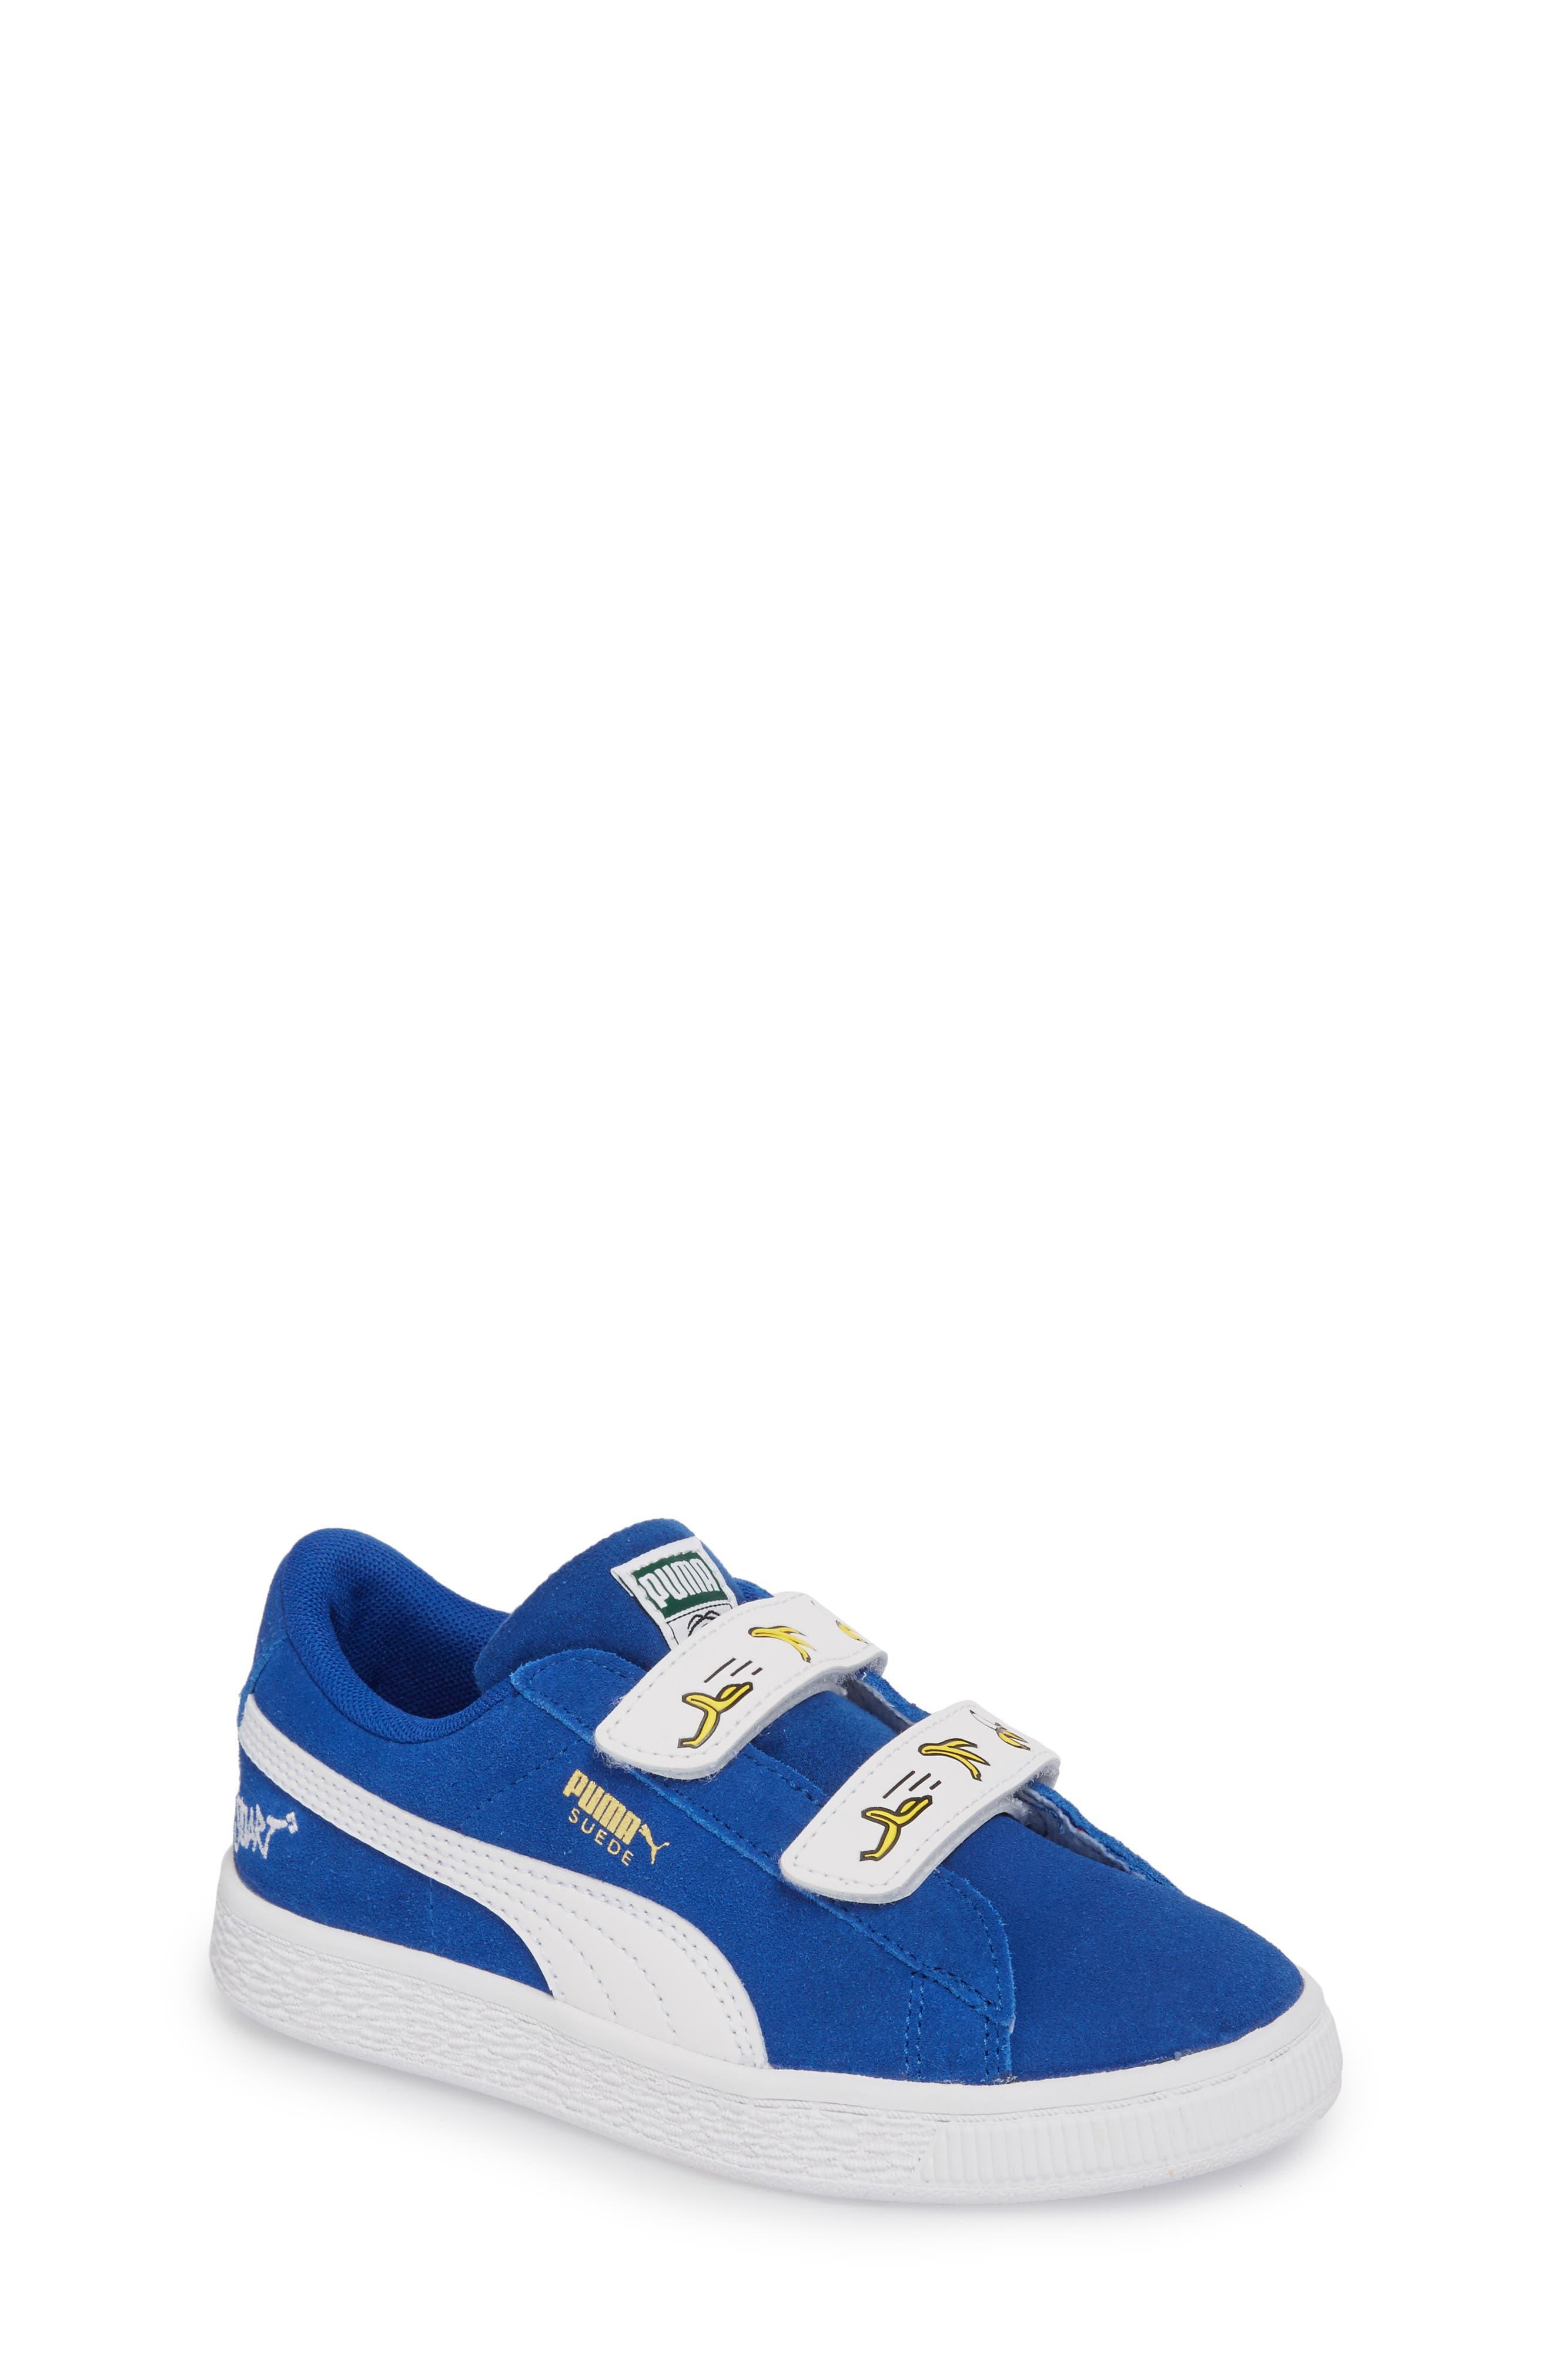 x Minions Suede V Sneaker,                         Main,                         color, Olympian Blue/ Puma White